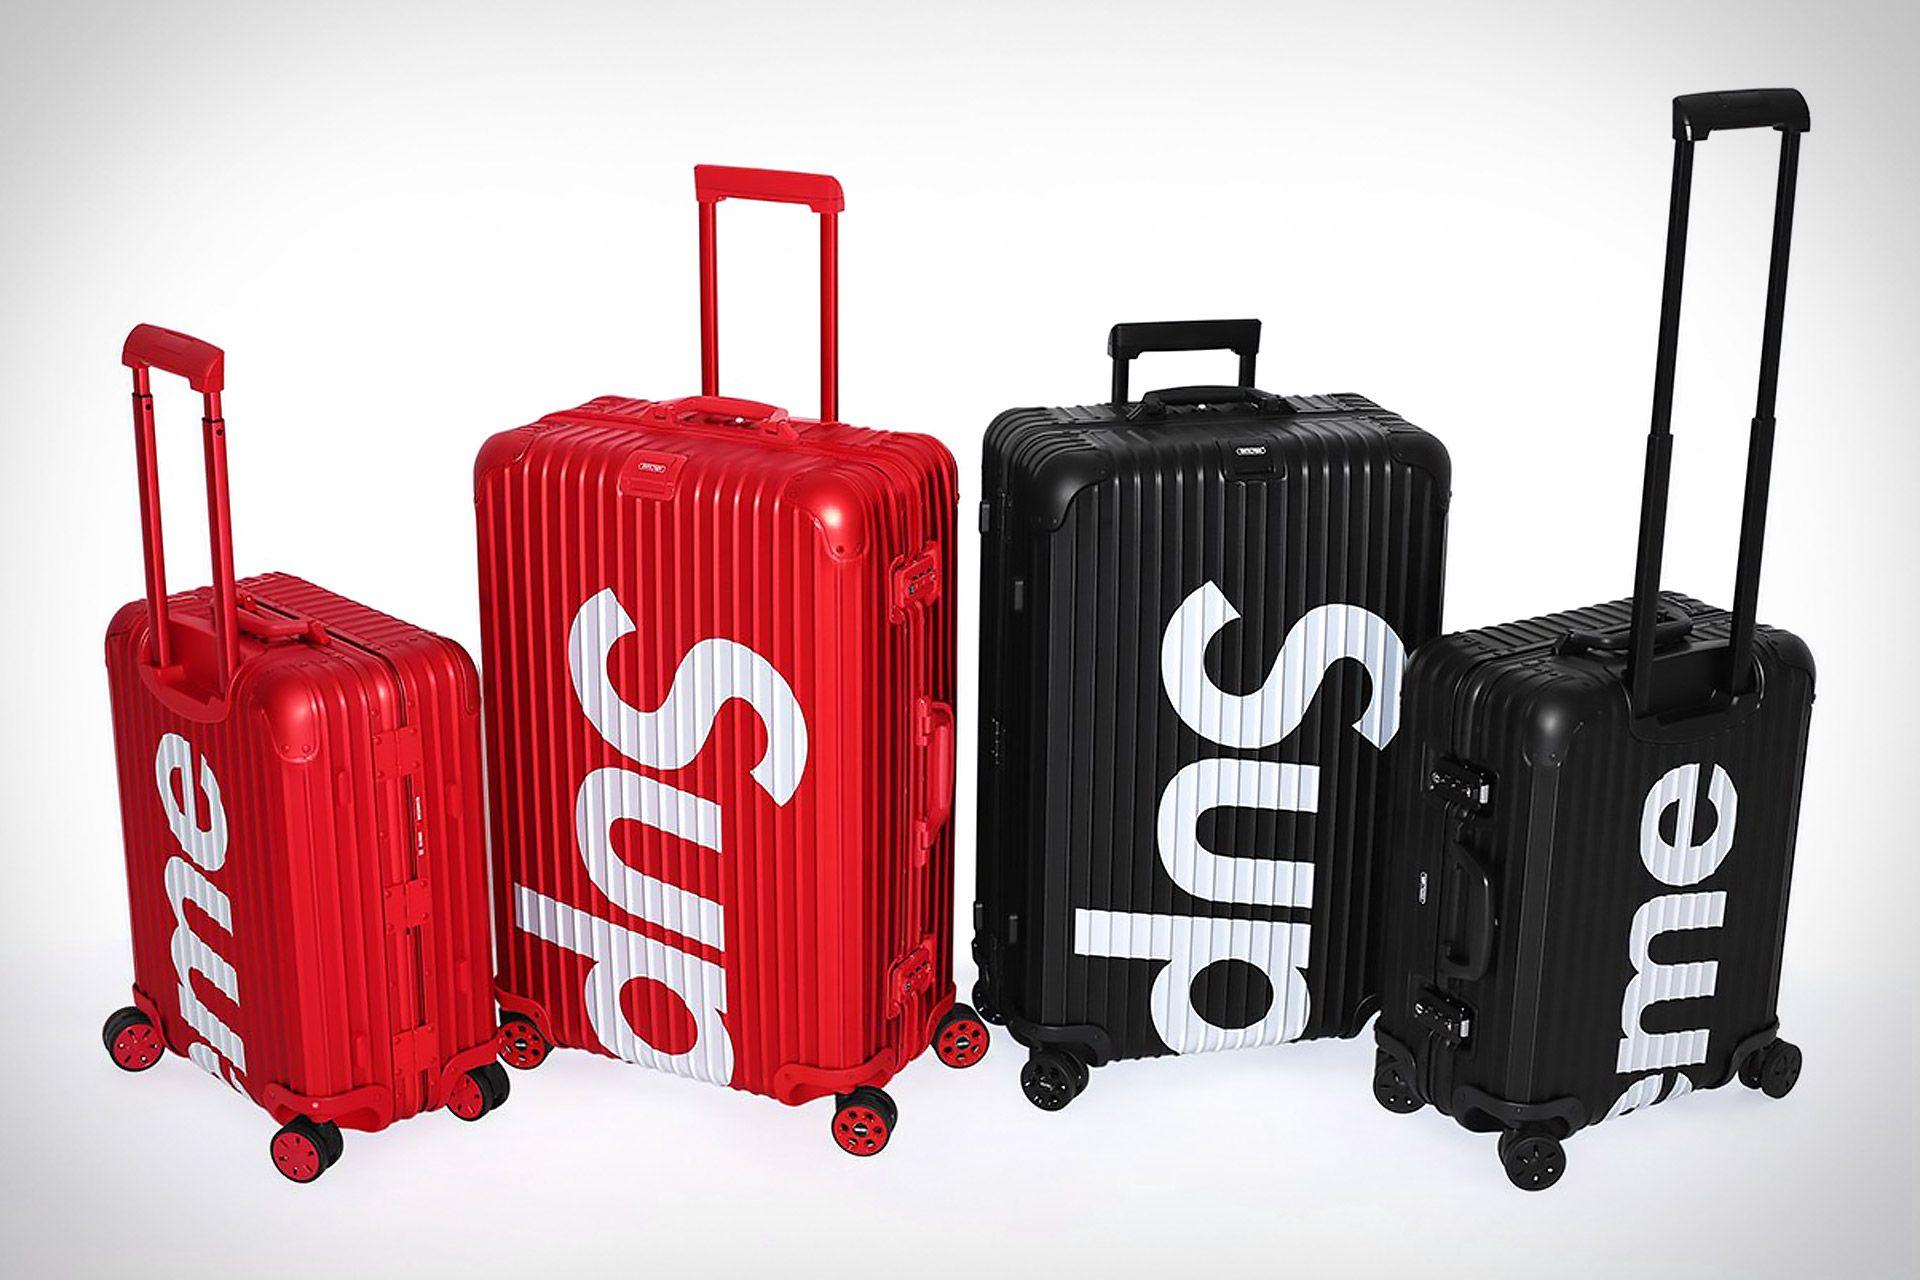 59cfa788f1d7 Rimowa x Supreme Topas Luggage